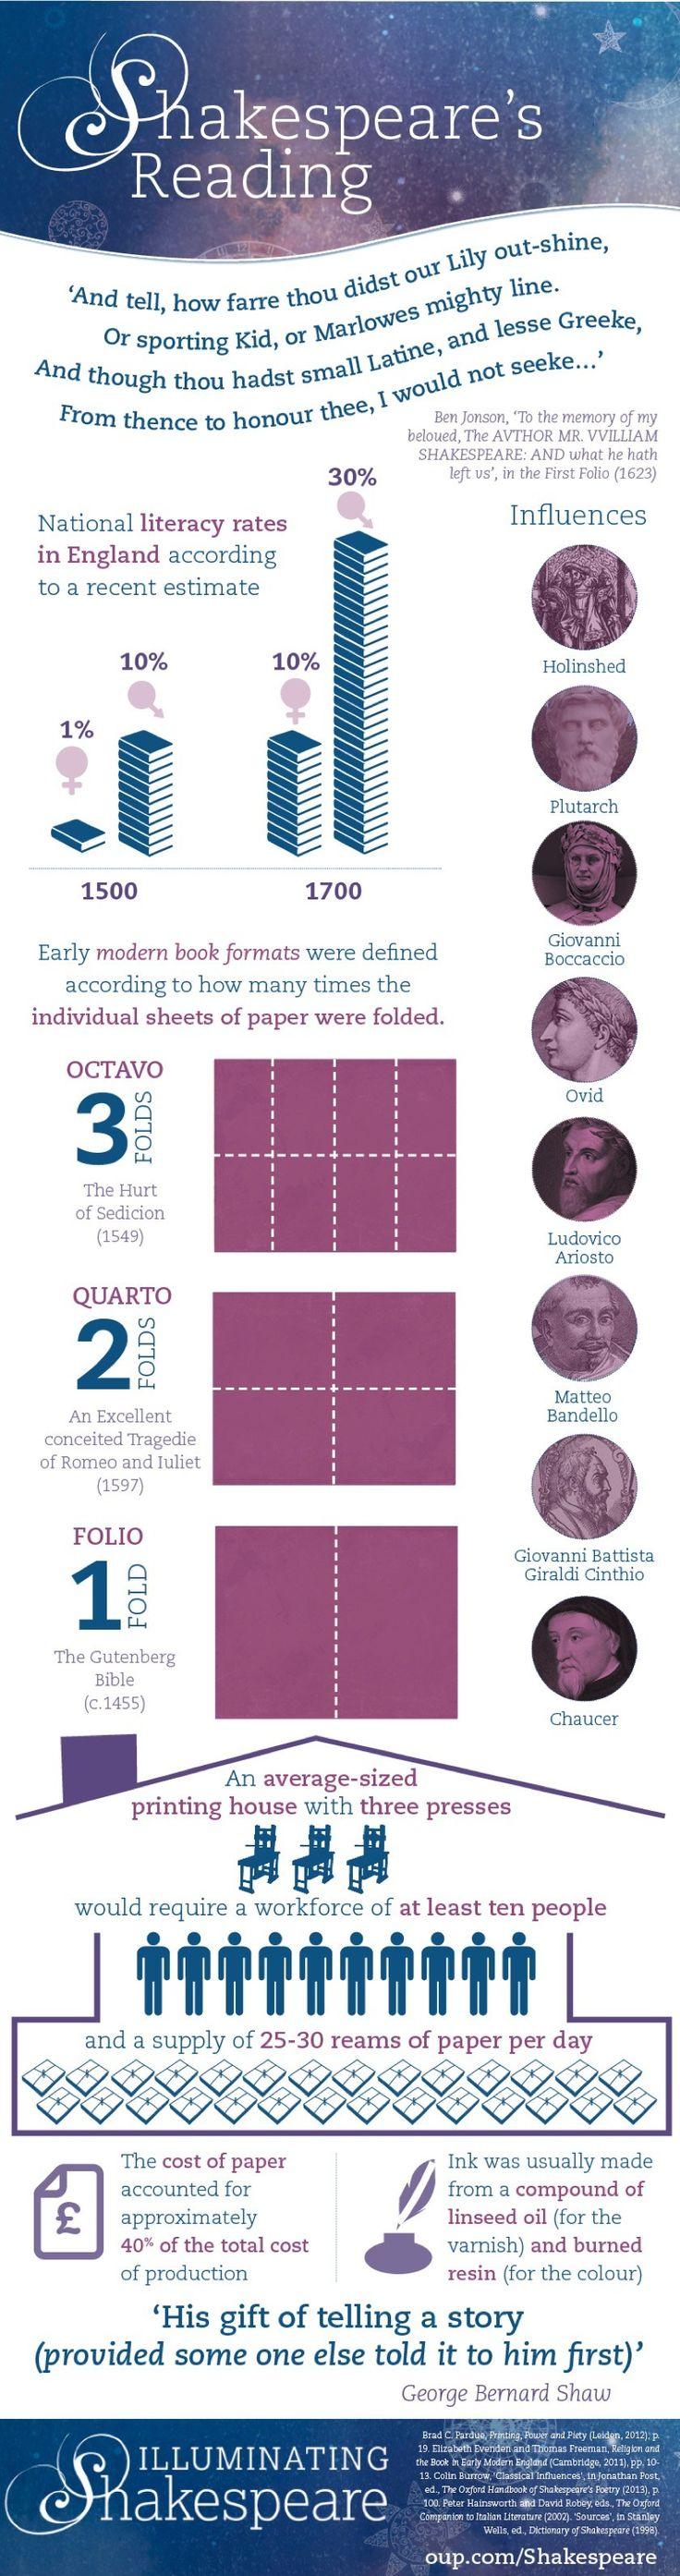 Shakespeare's Reading Graphic Full